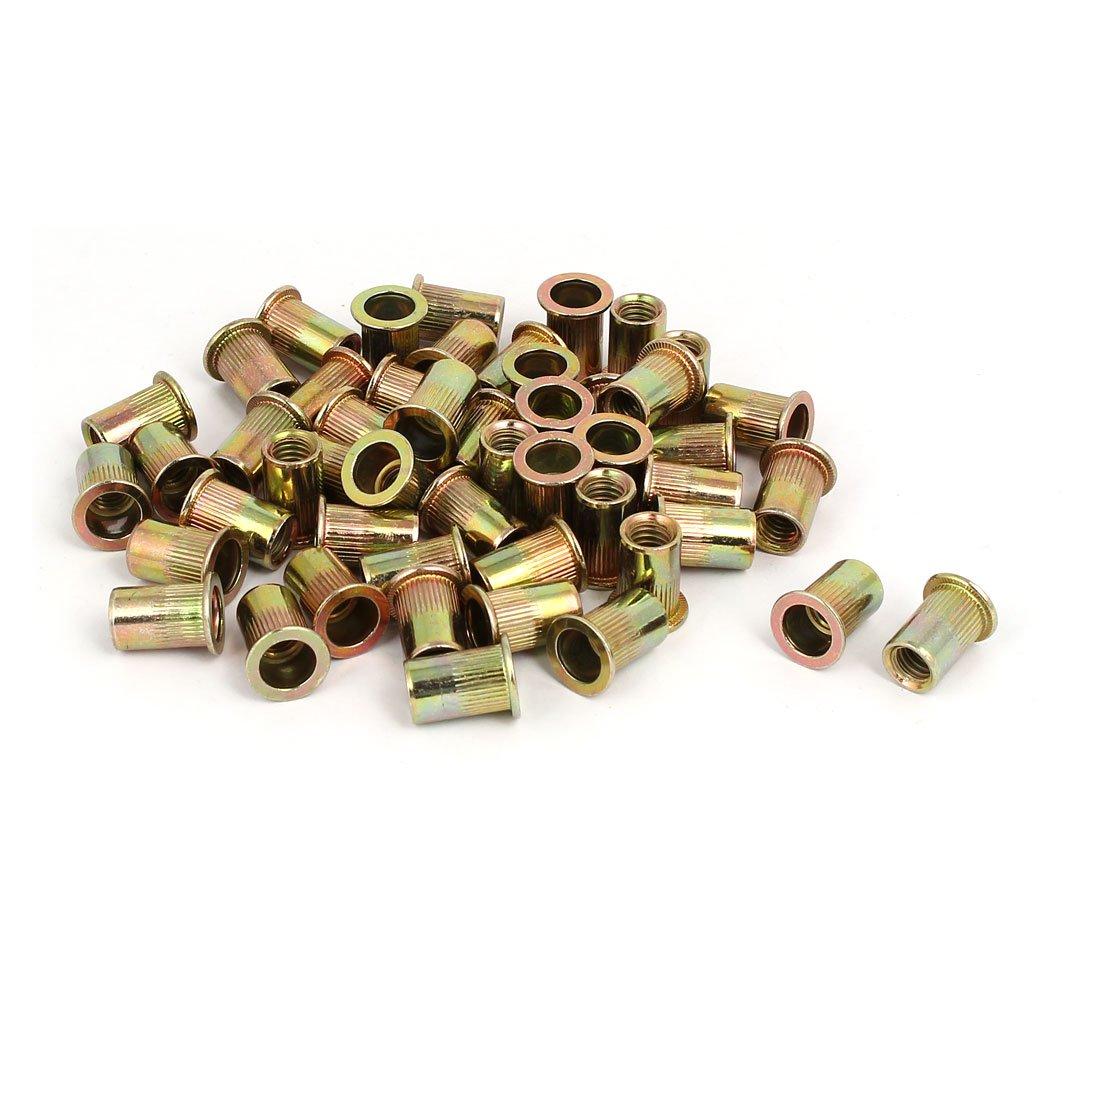 uxcell 5/16 Inch Female Thread Straight Knurled Rivet Nuts Insert Nutserts Bronze Tone 50pcs